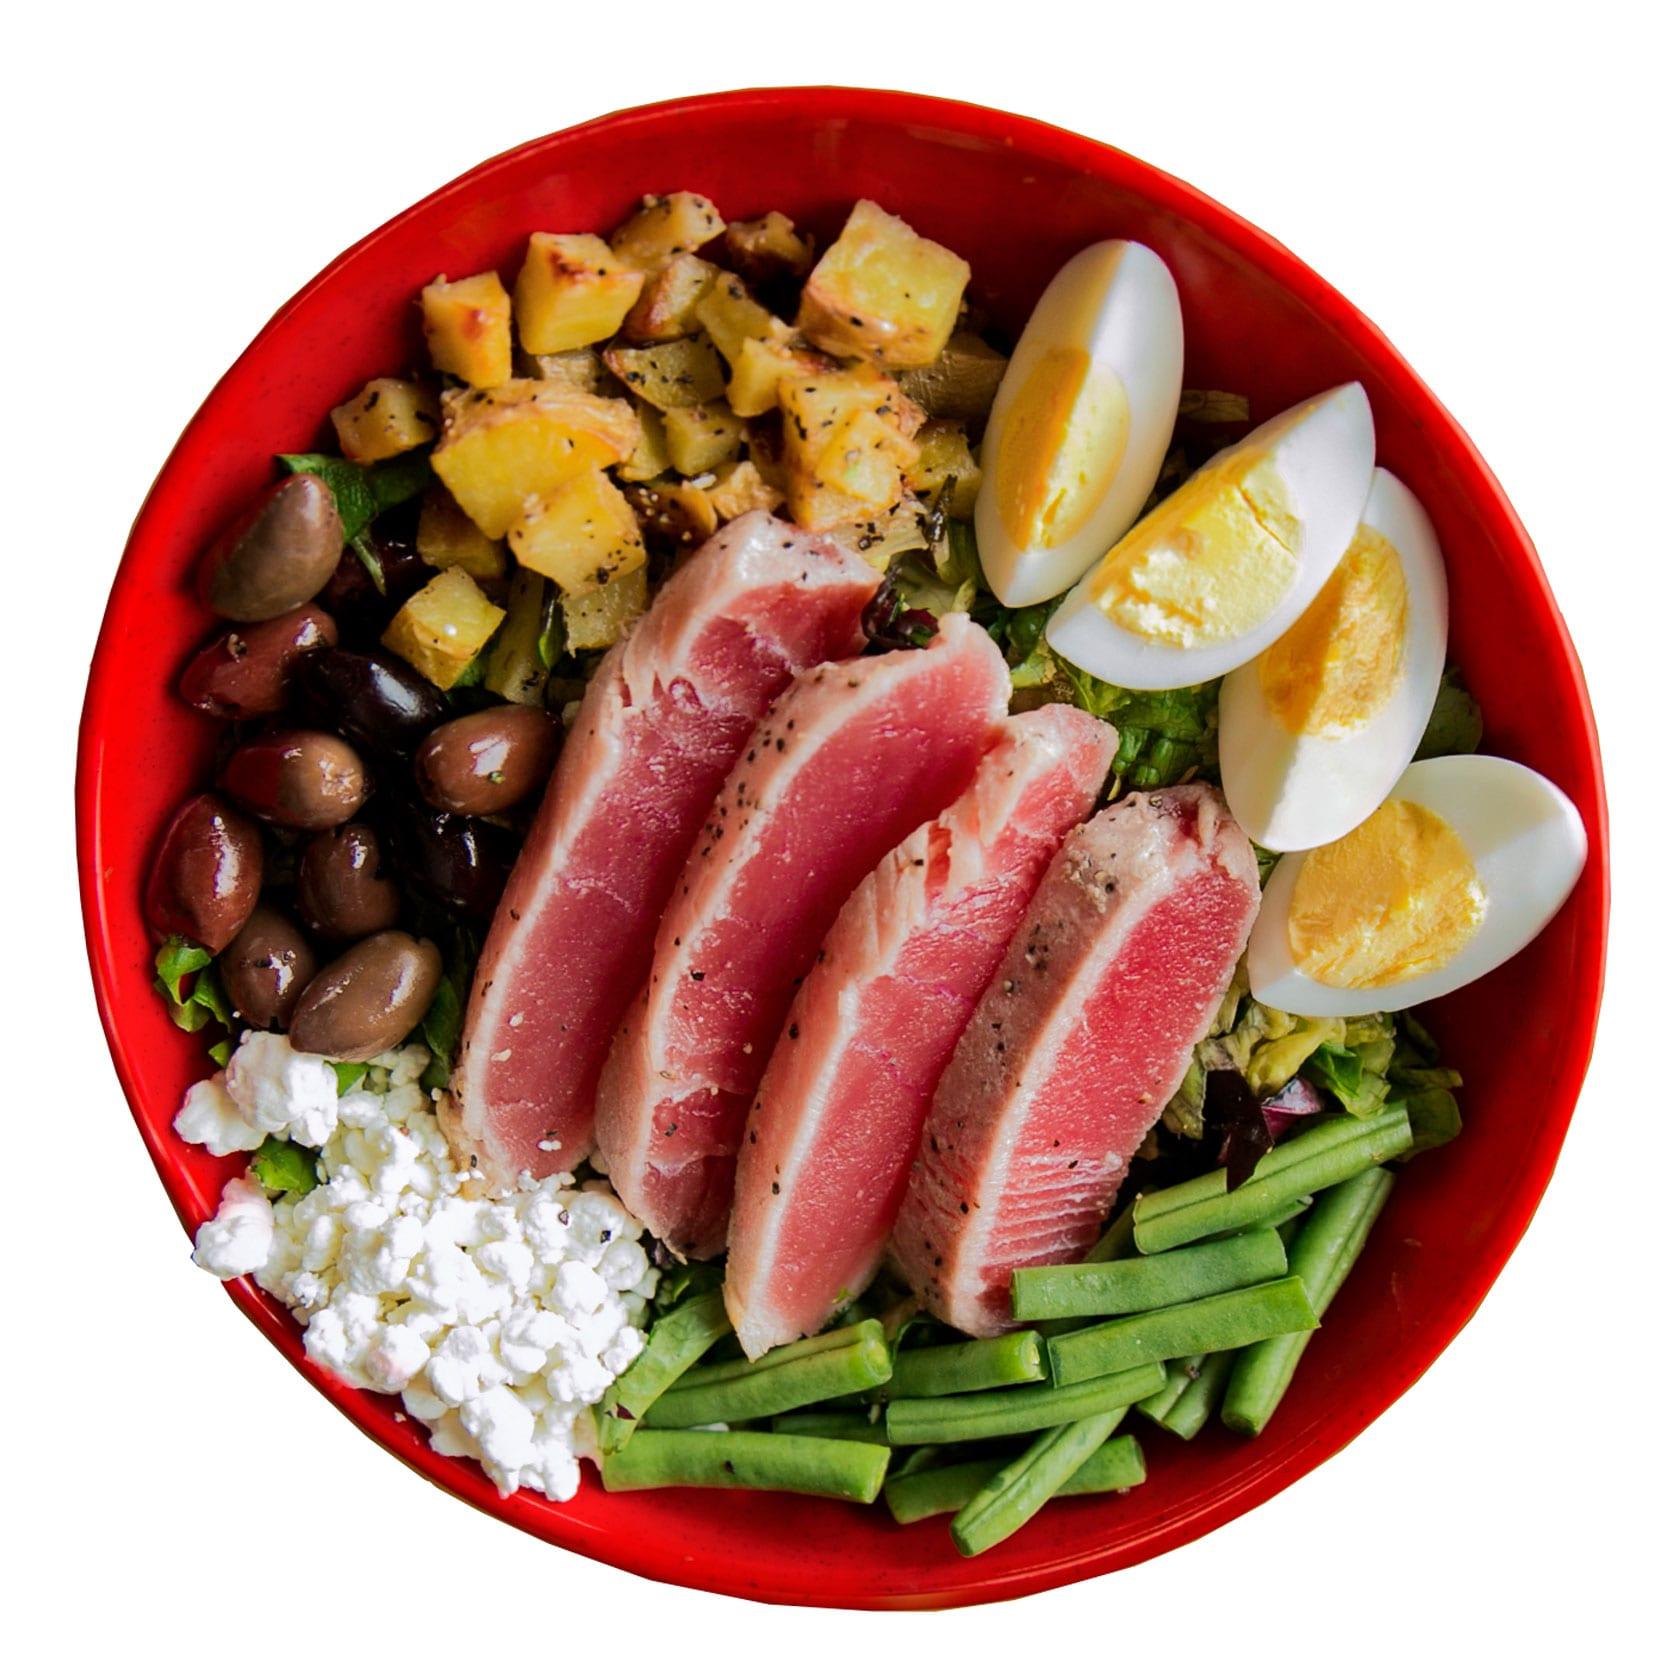 Crushed Red Tunapalooza Urban Crafted Salad